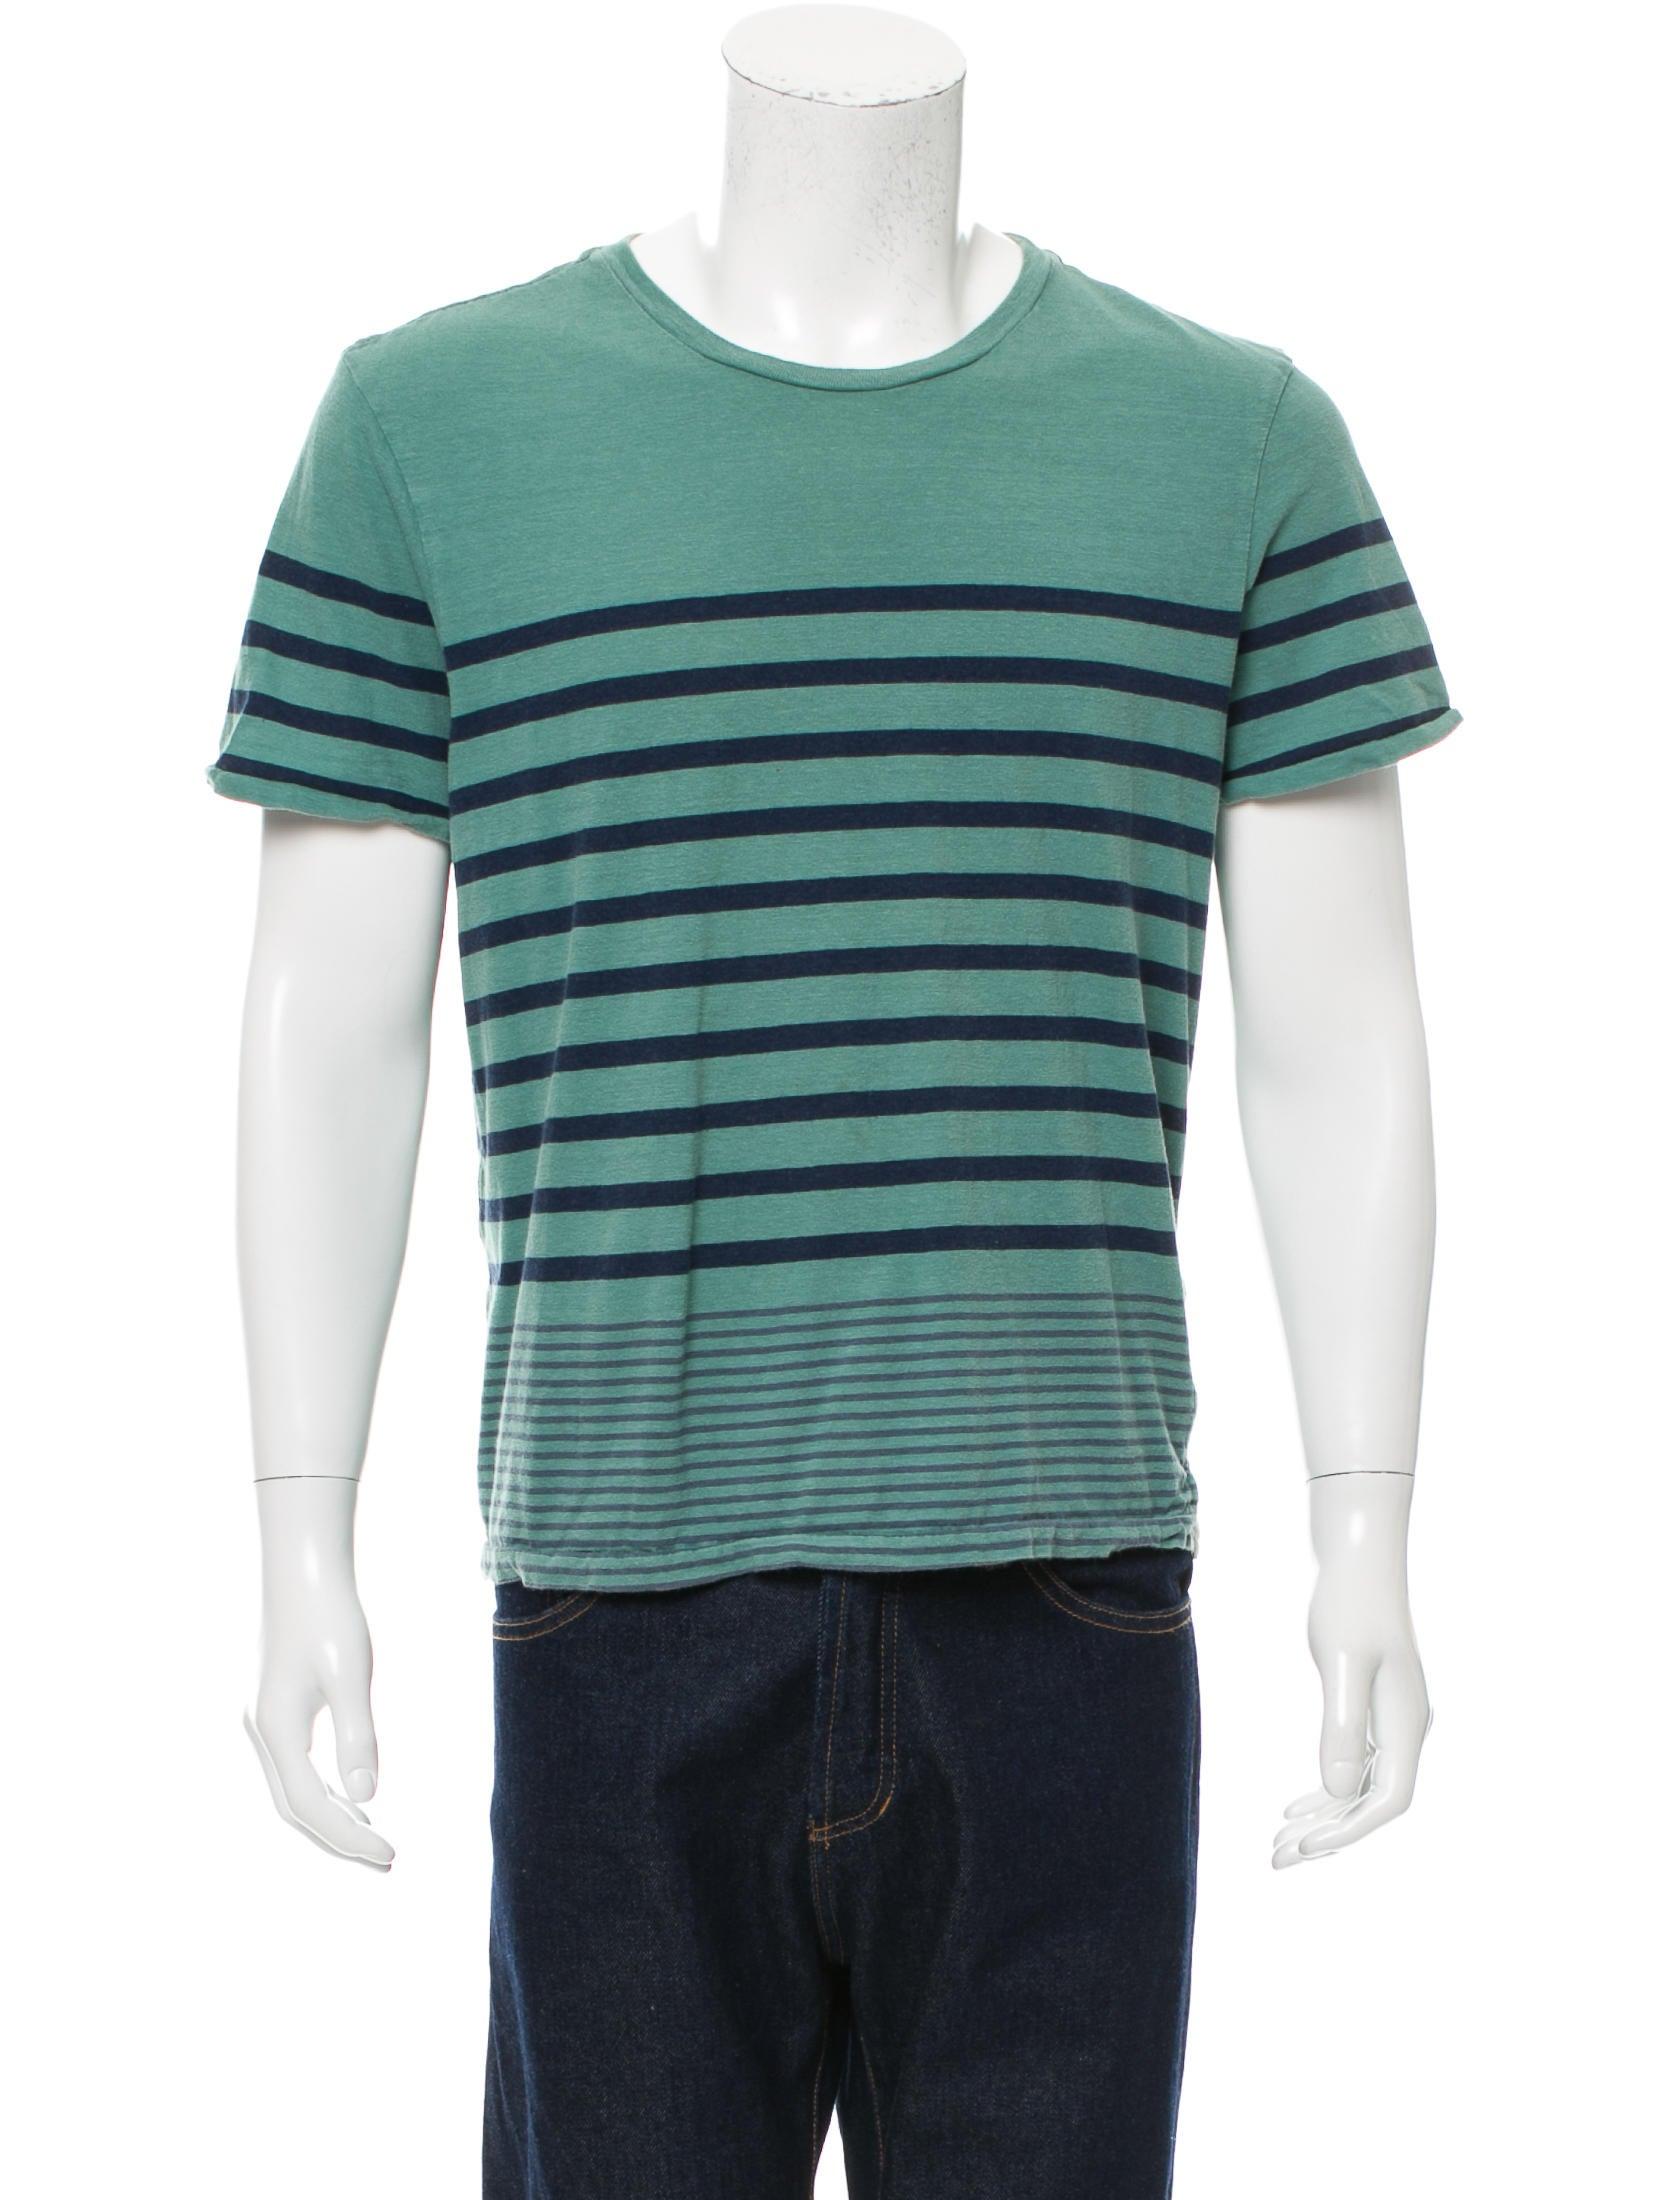 Rag Bone Striped Scoop Neck T Shirt Clothing